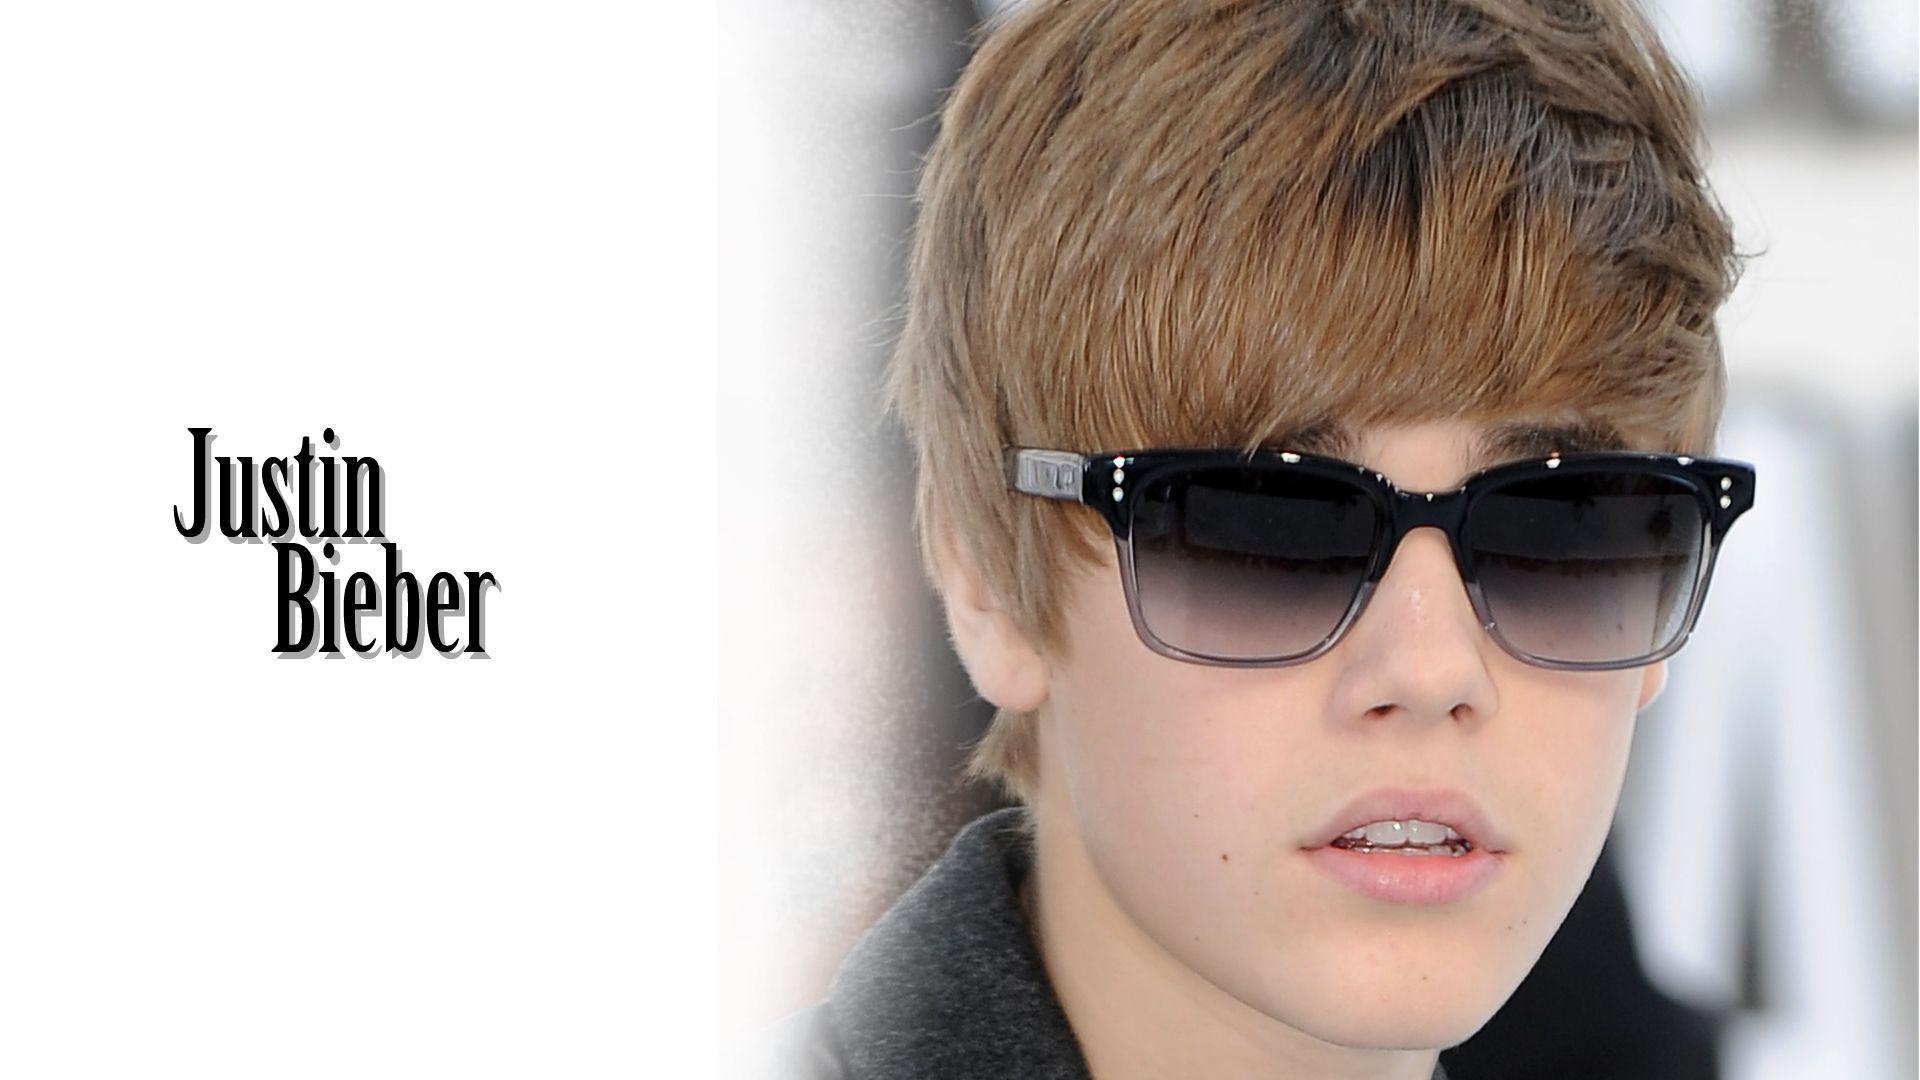 Hd wallpaper justin bieber - Wallpaper Justin Bieber